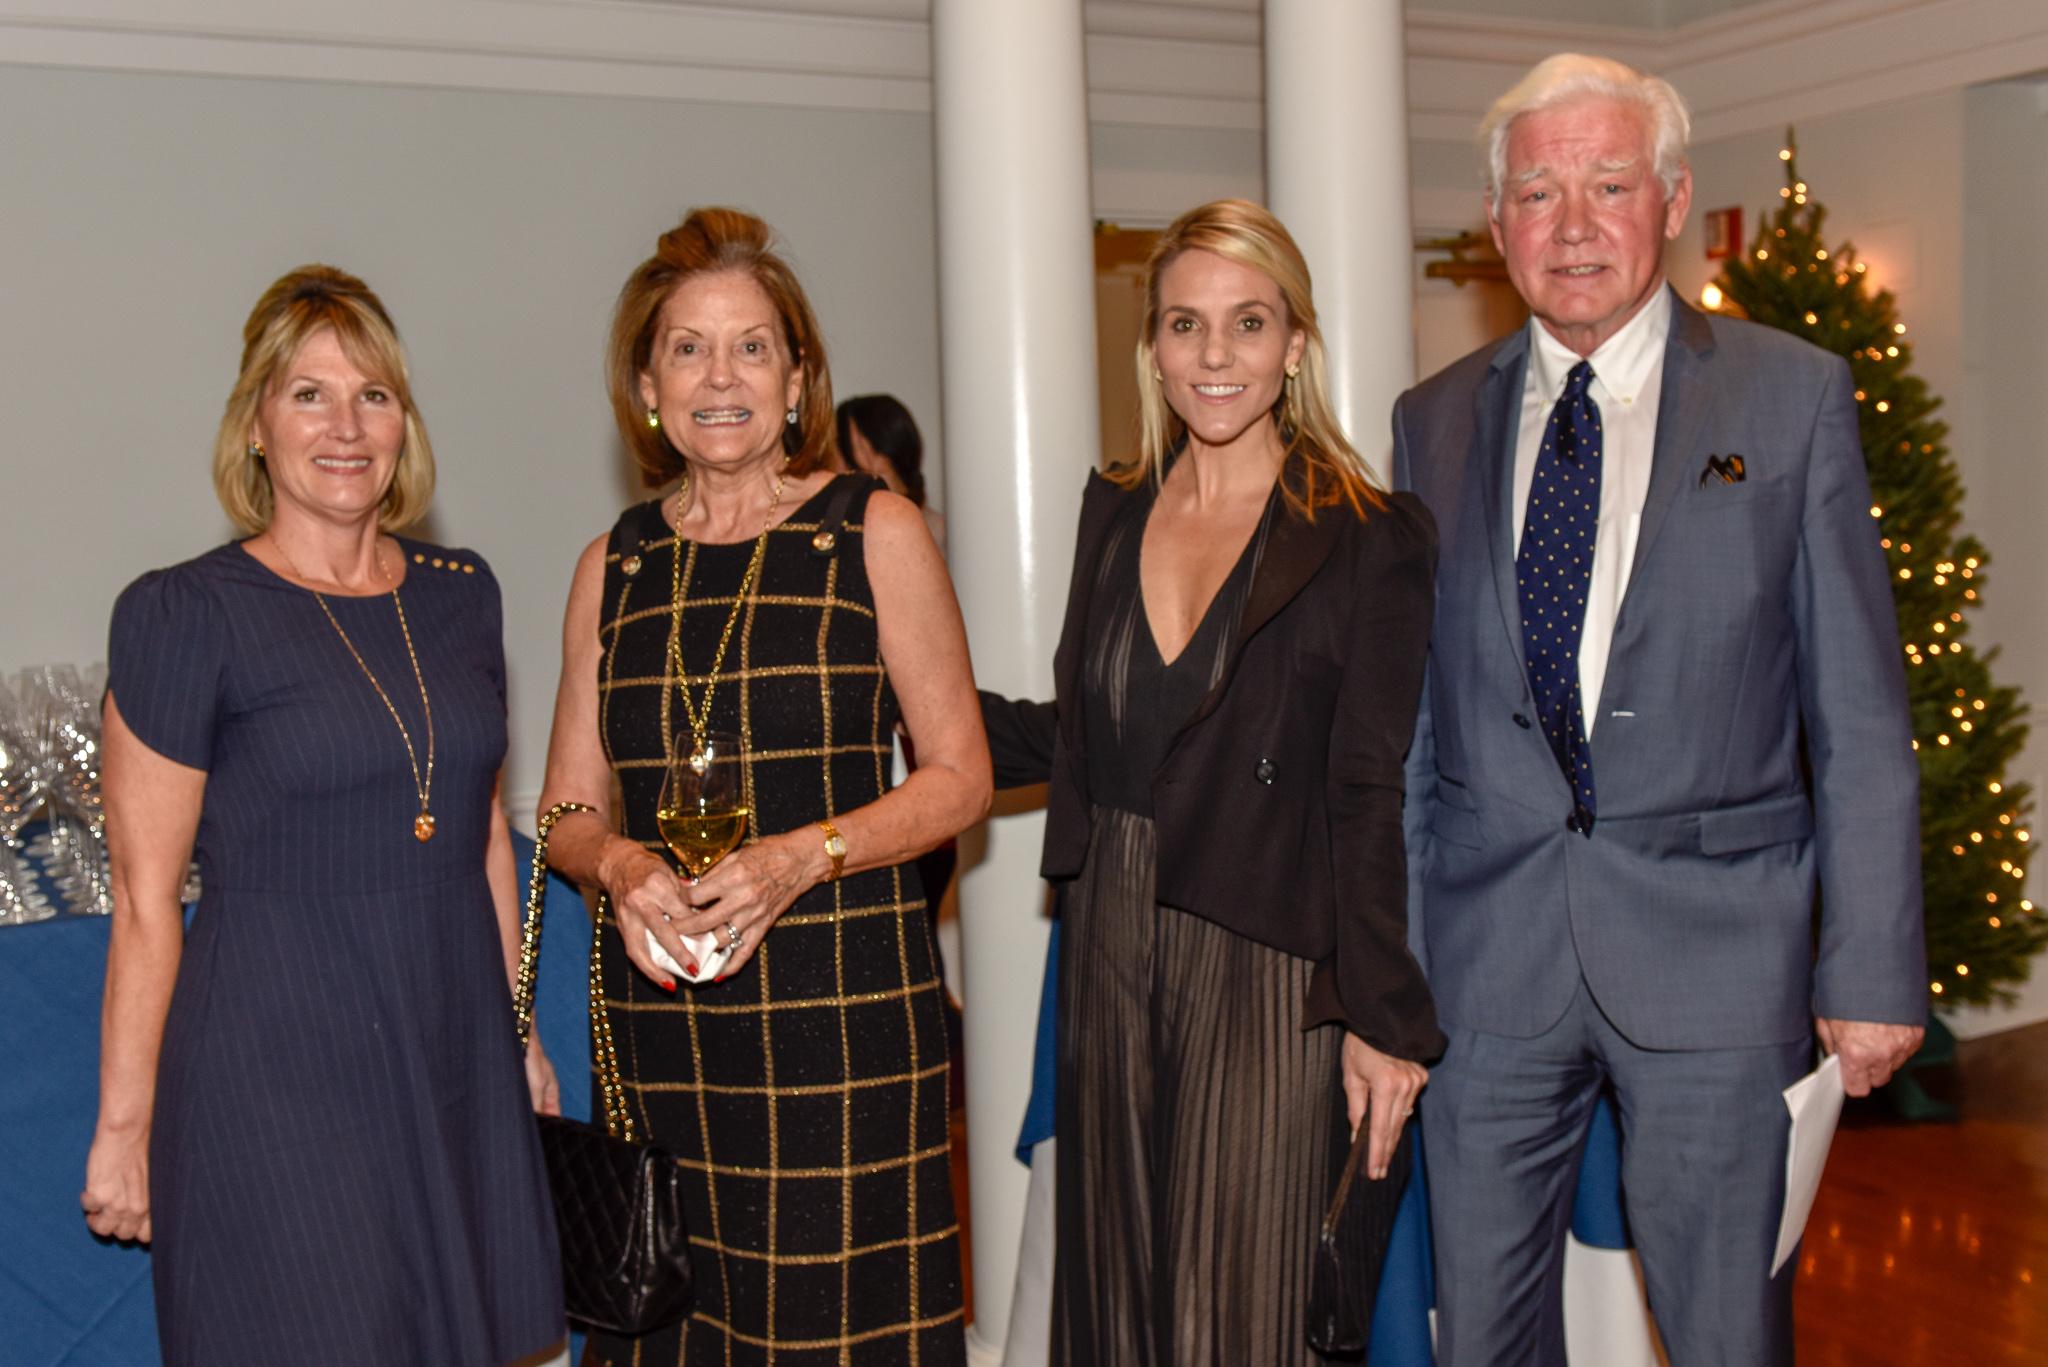 Carolyn Westerberg, Lucy Glasebrook, Erin Glasebrook, Peter Sutton